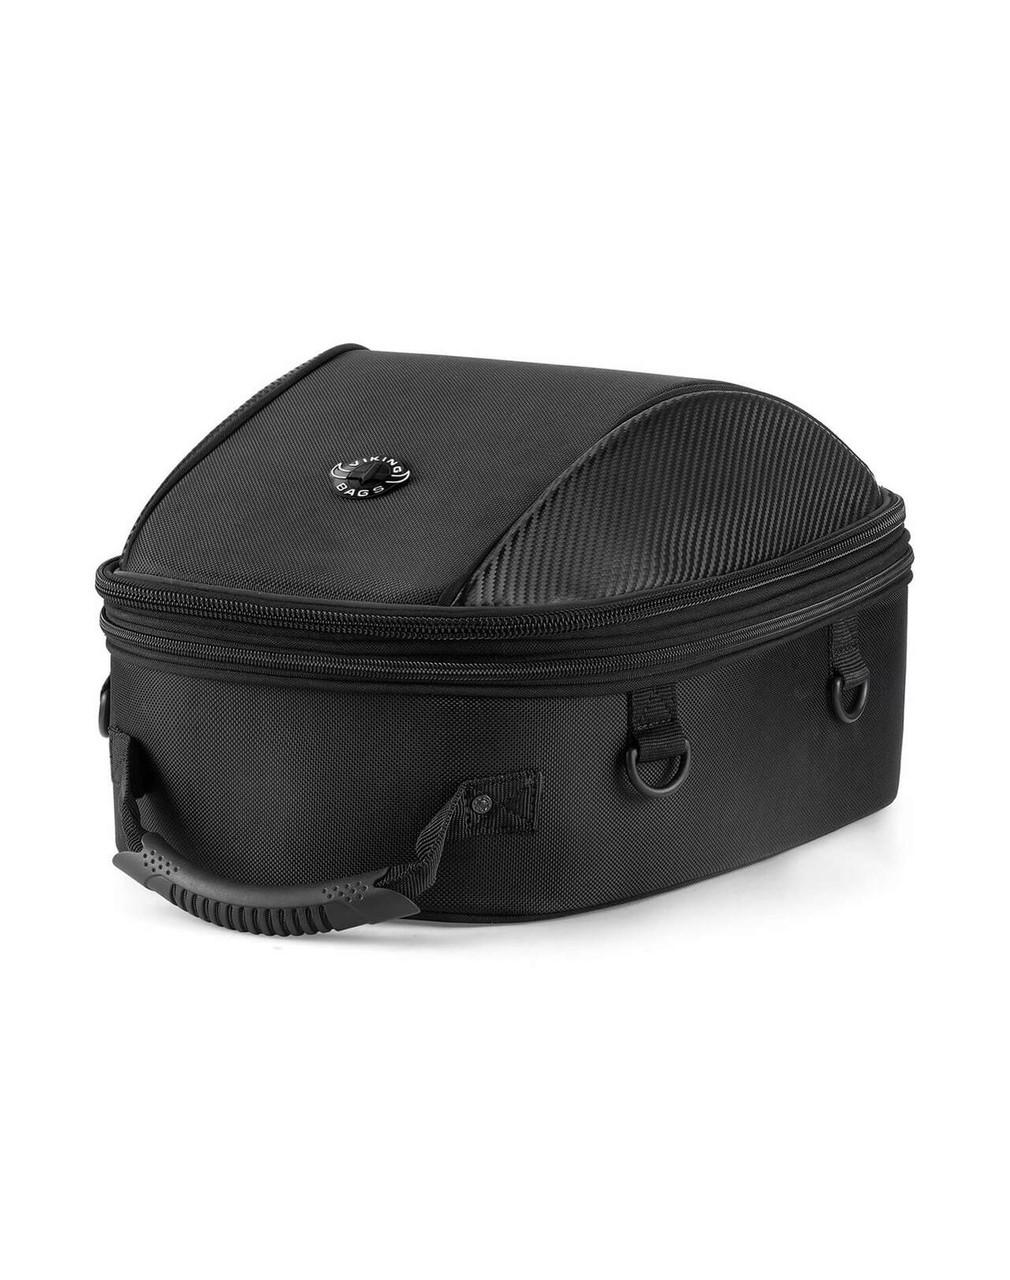 Viking Medium Black Street/Sportbike Tail Bag Main View